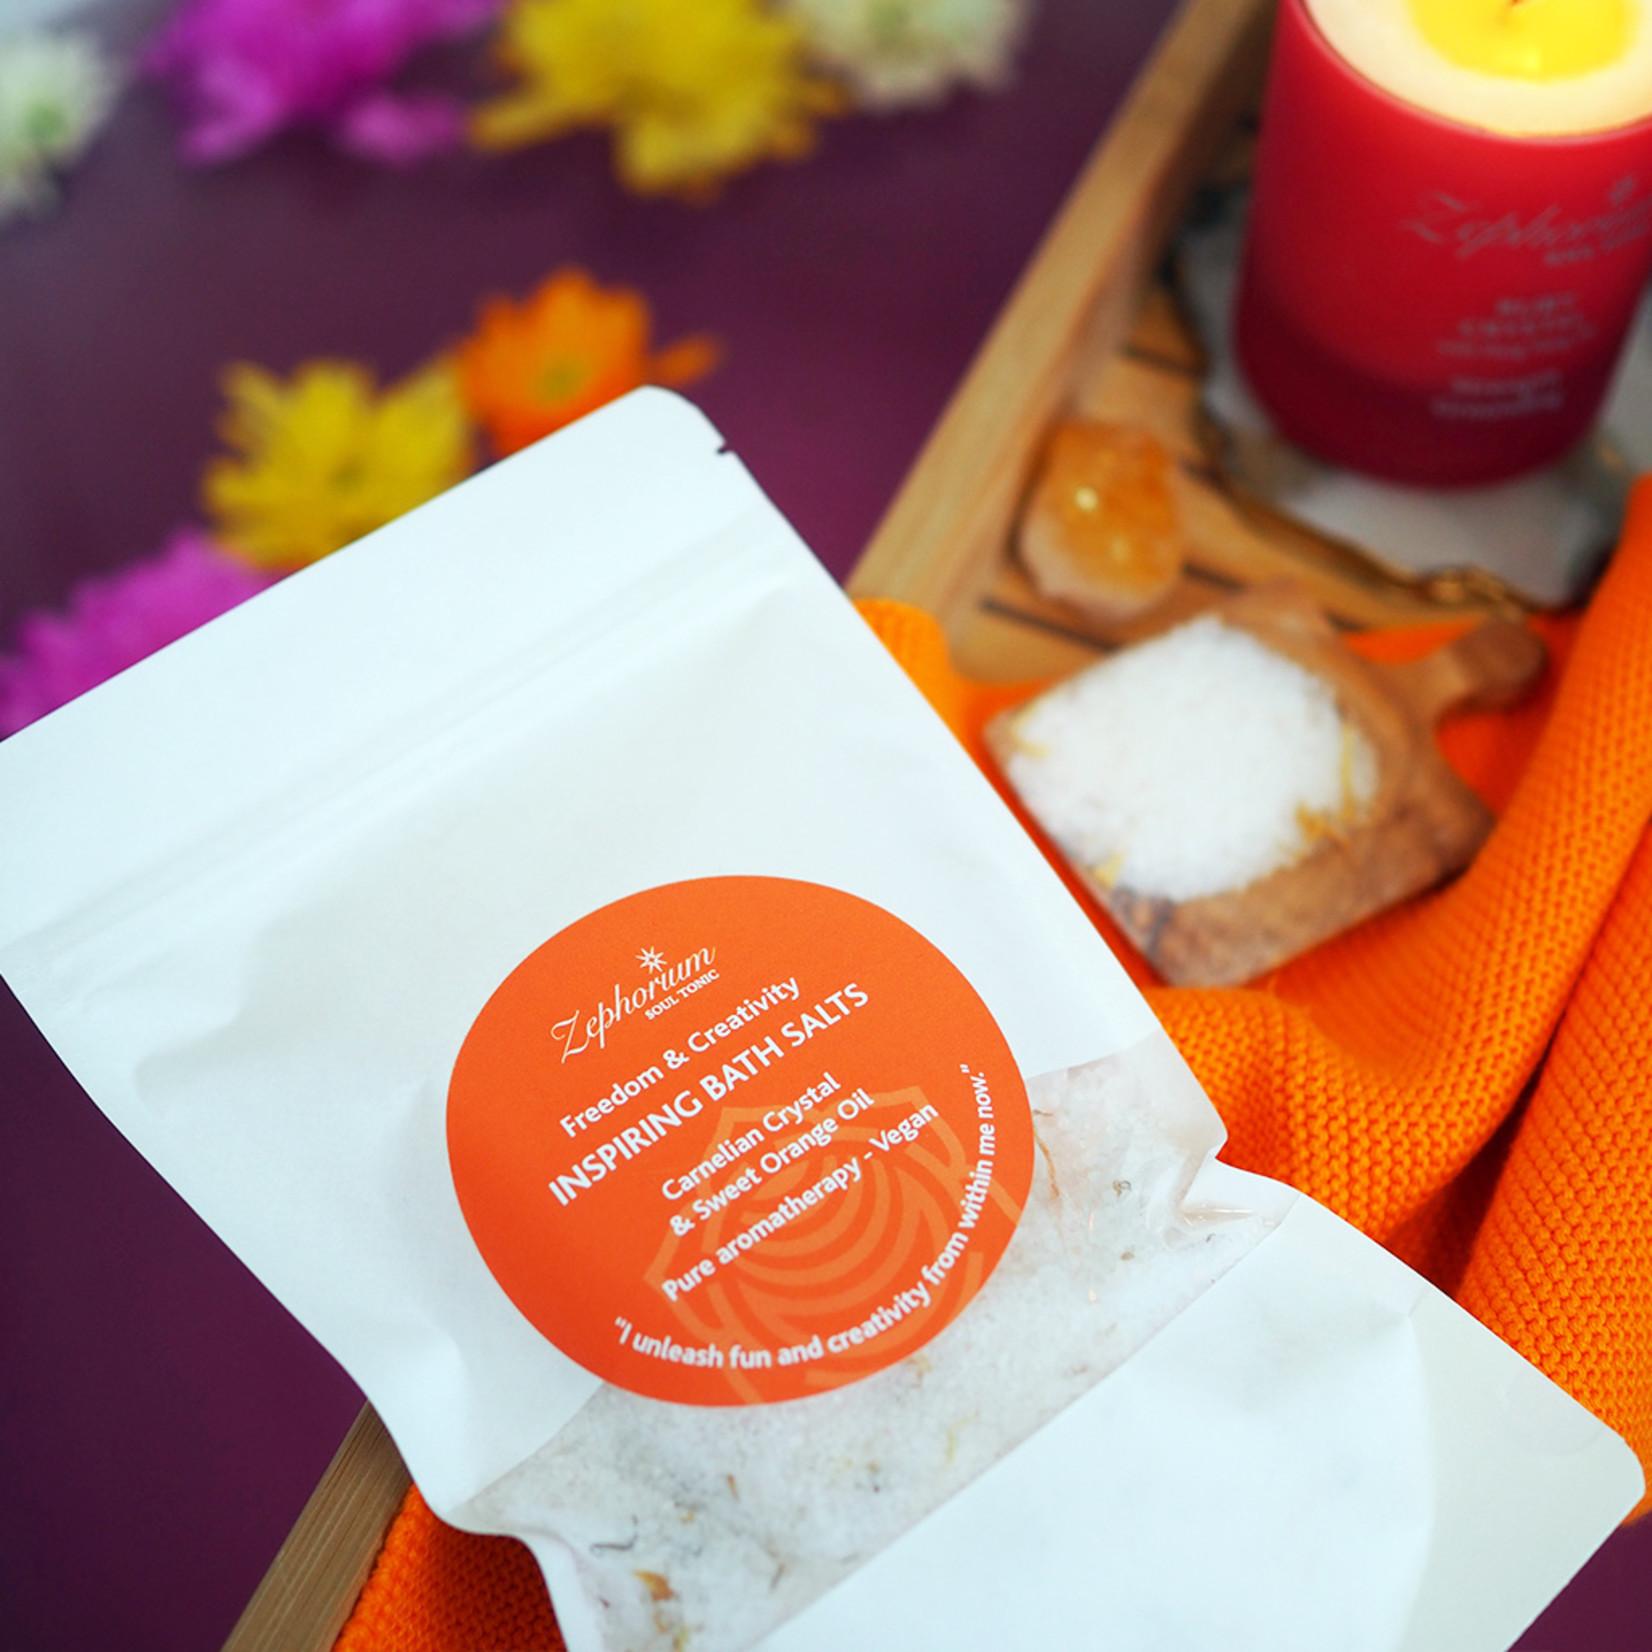 Zephorium Inspiring bath salts - carnelian